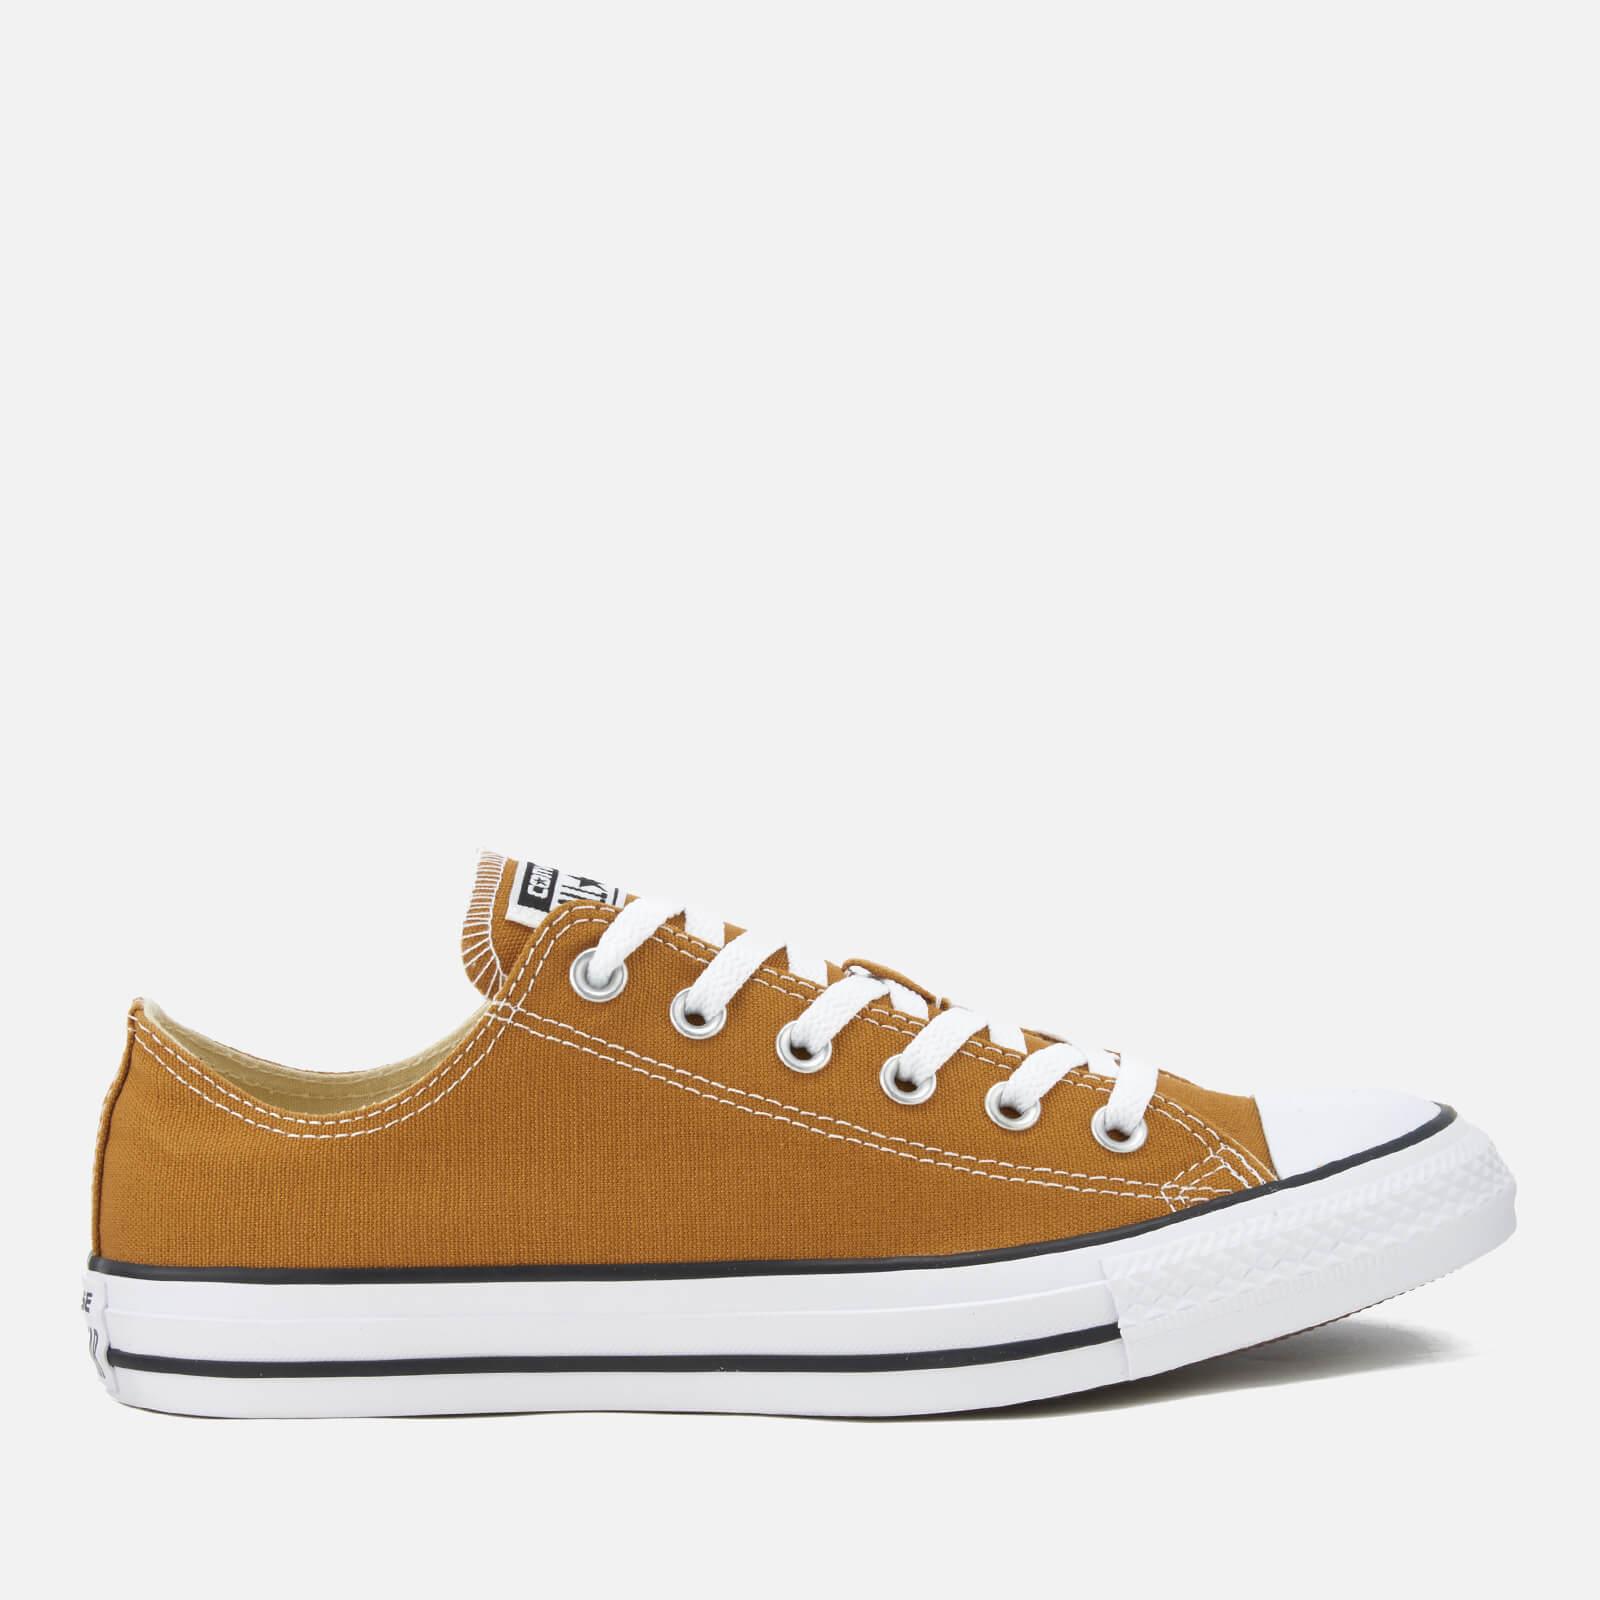 converse raw sugar Shop Clothing & Shoes Online